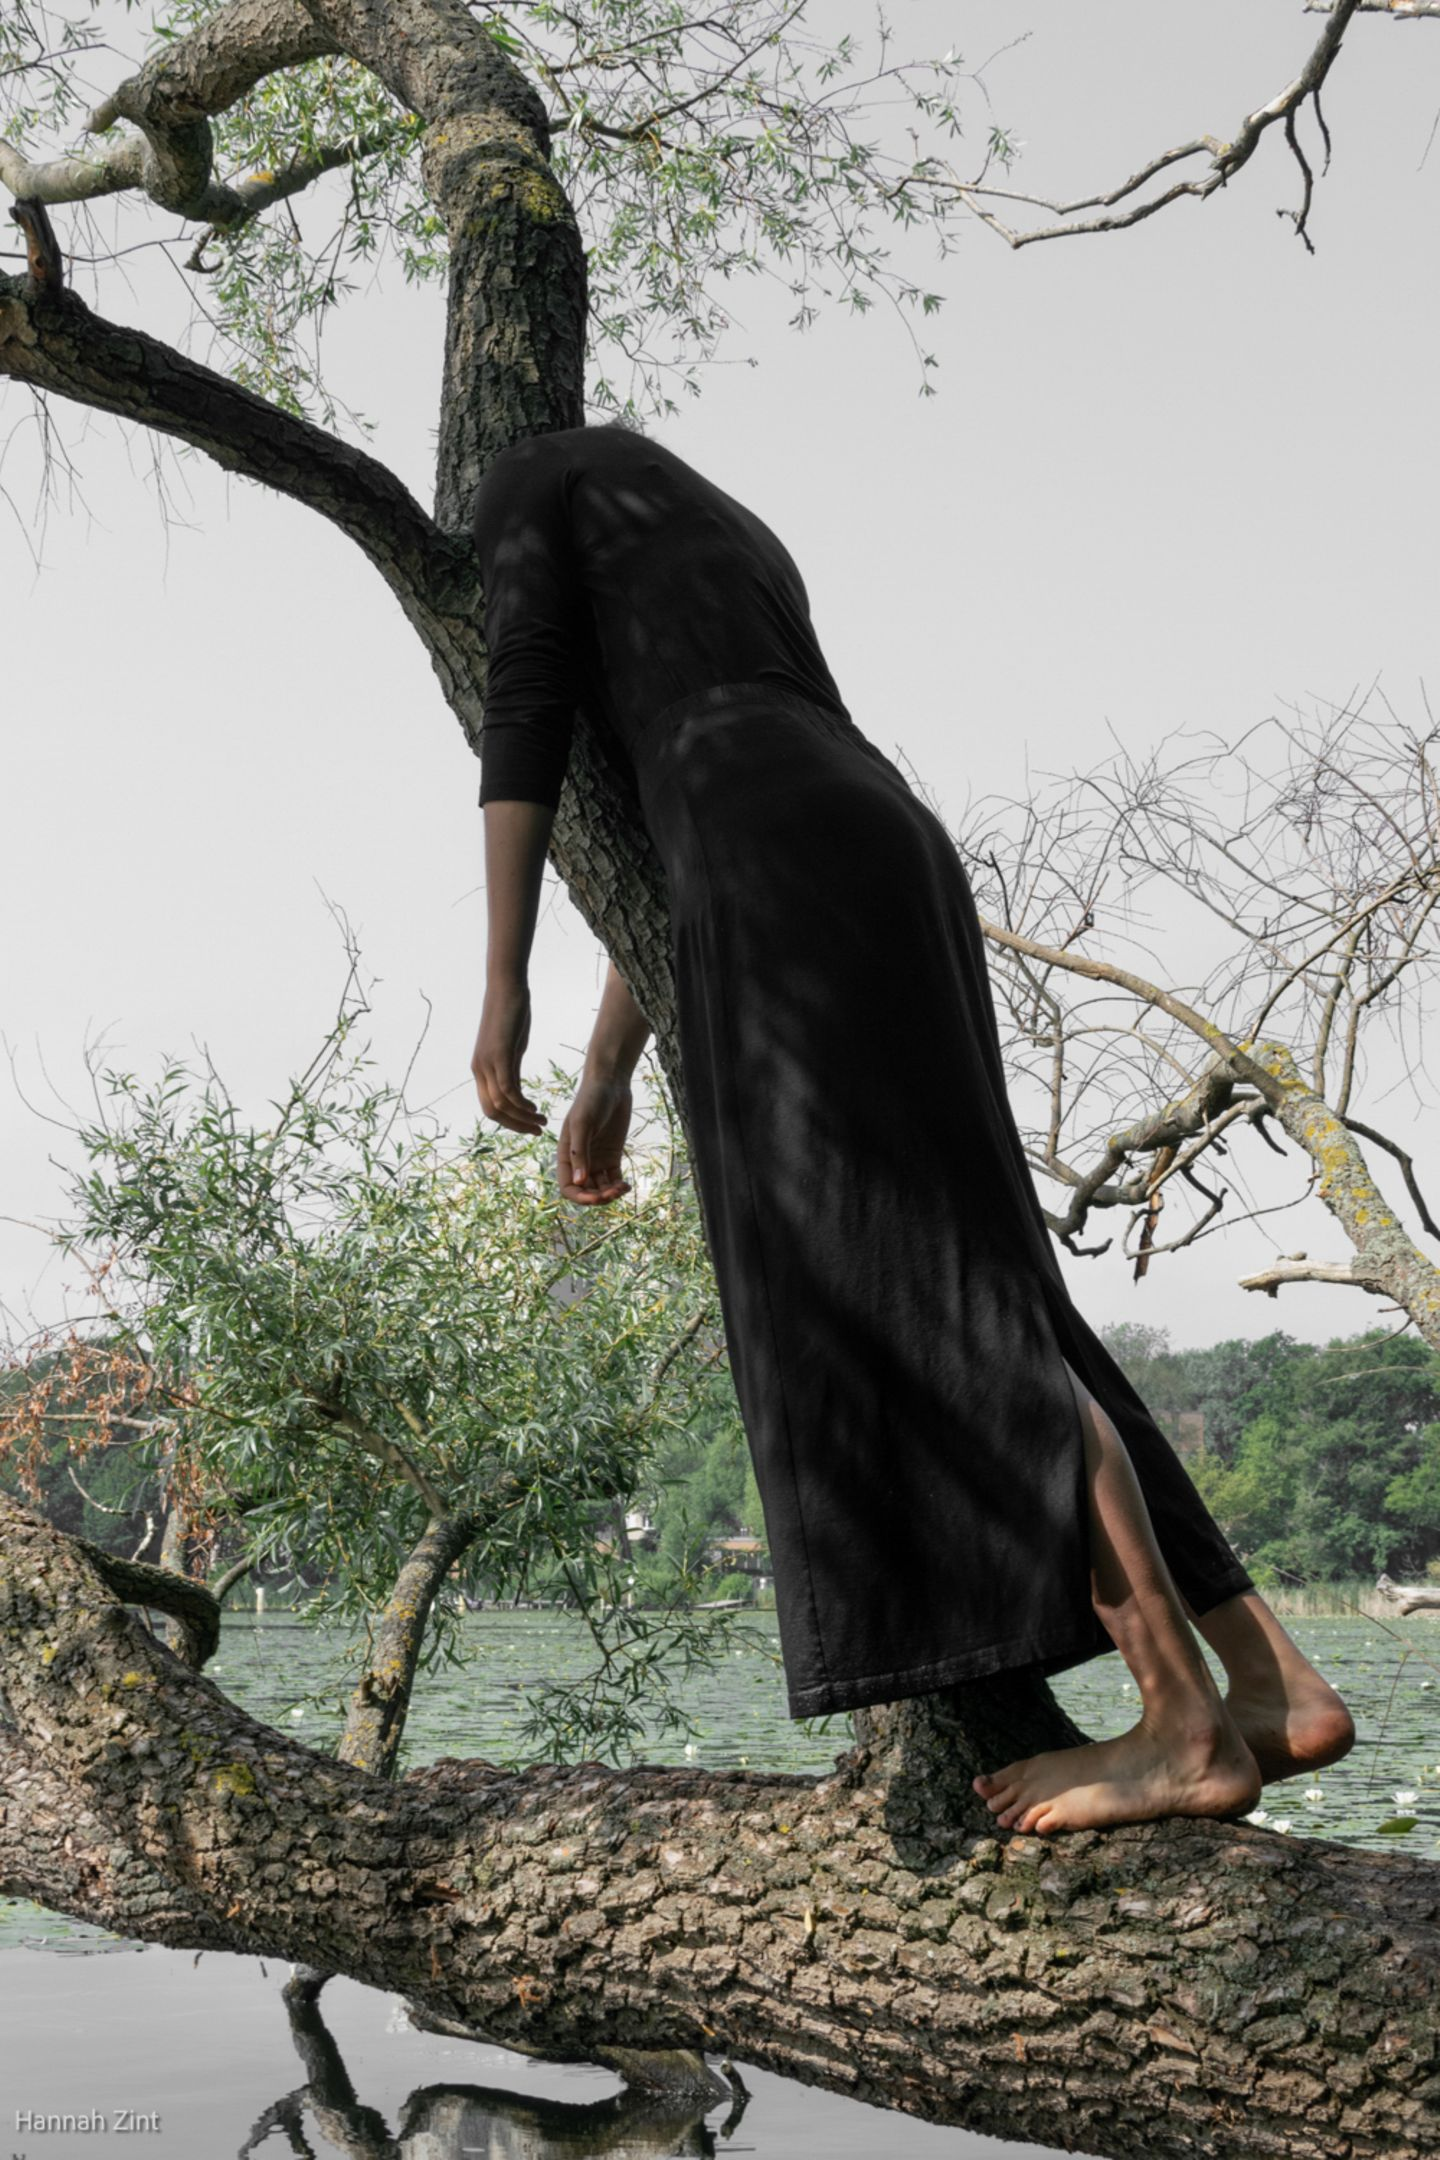 Endometriose in Bildern: Frau am Baum